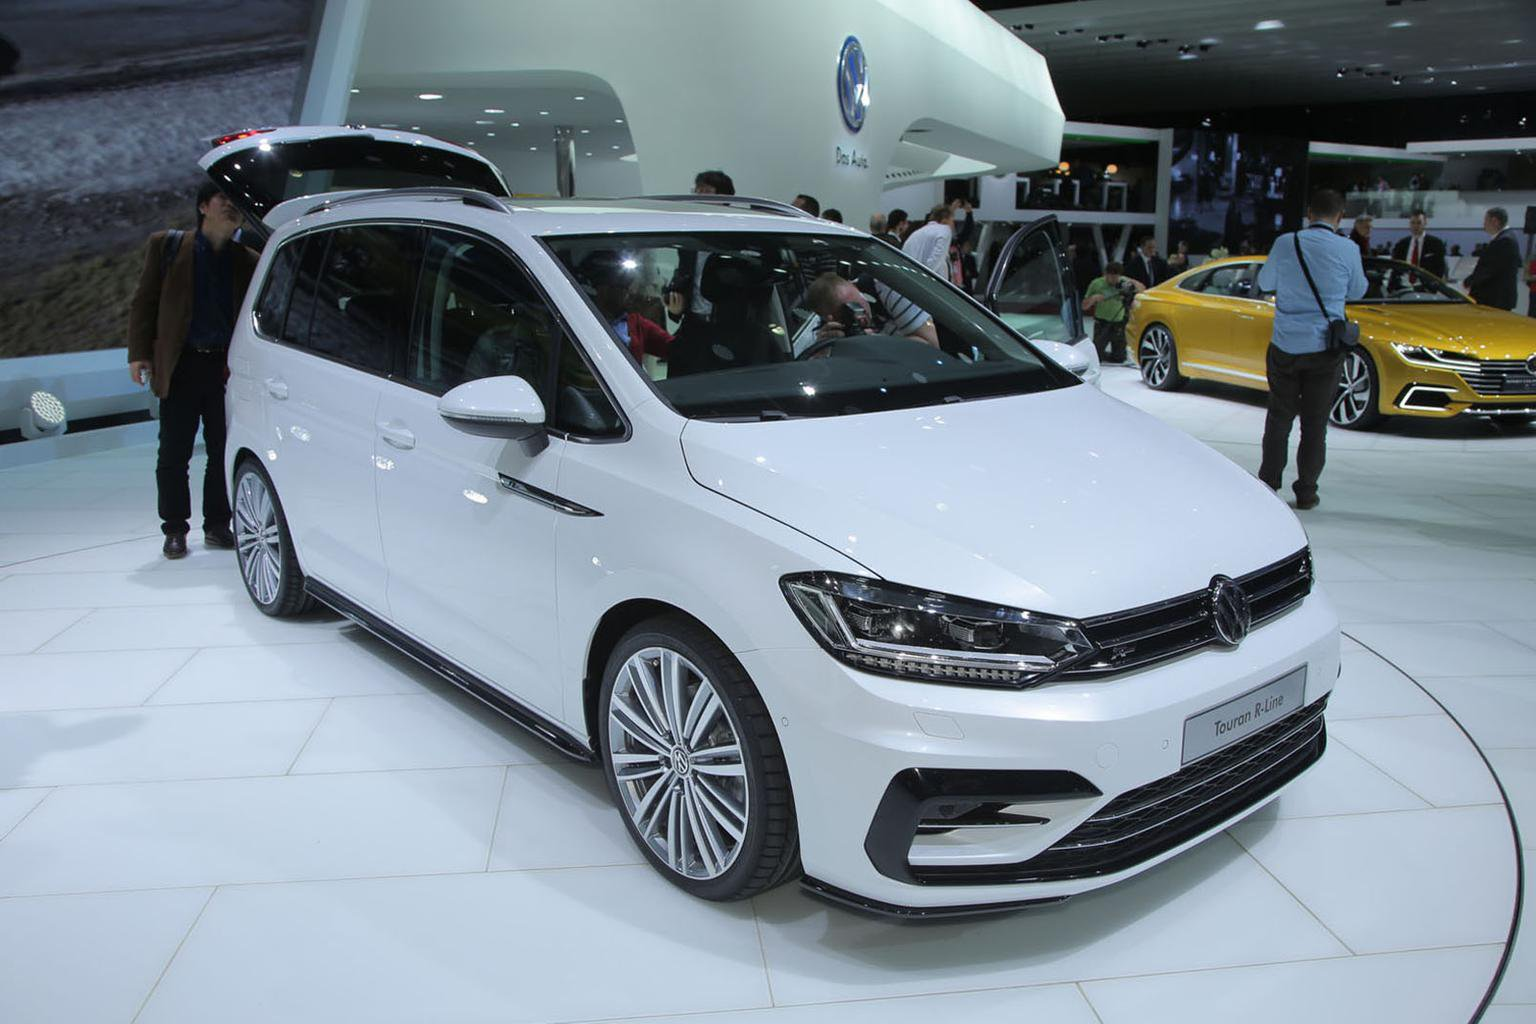 2016 Volkswagen Touran priced from 22,240